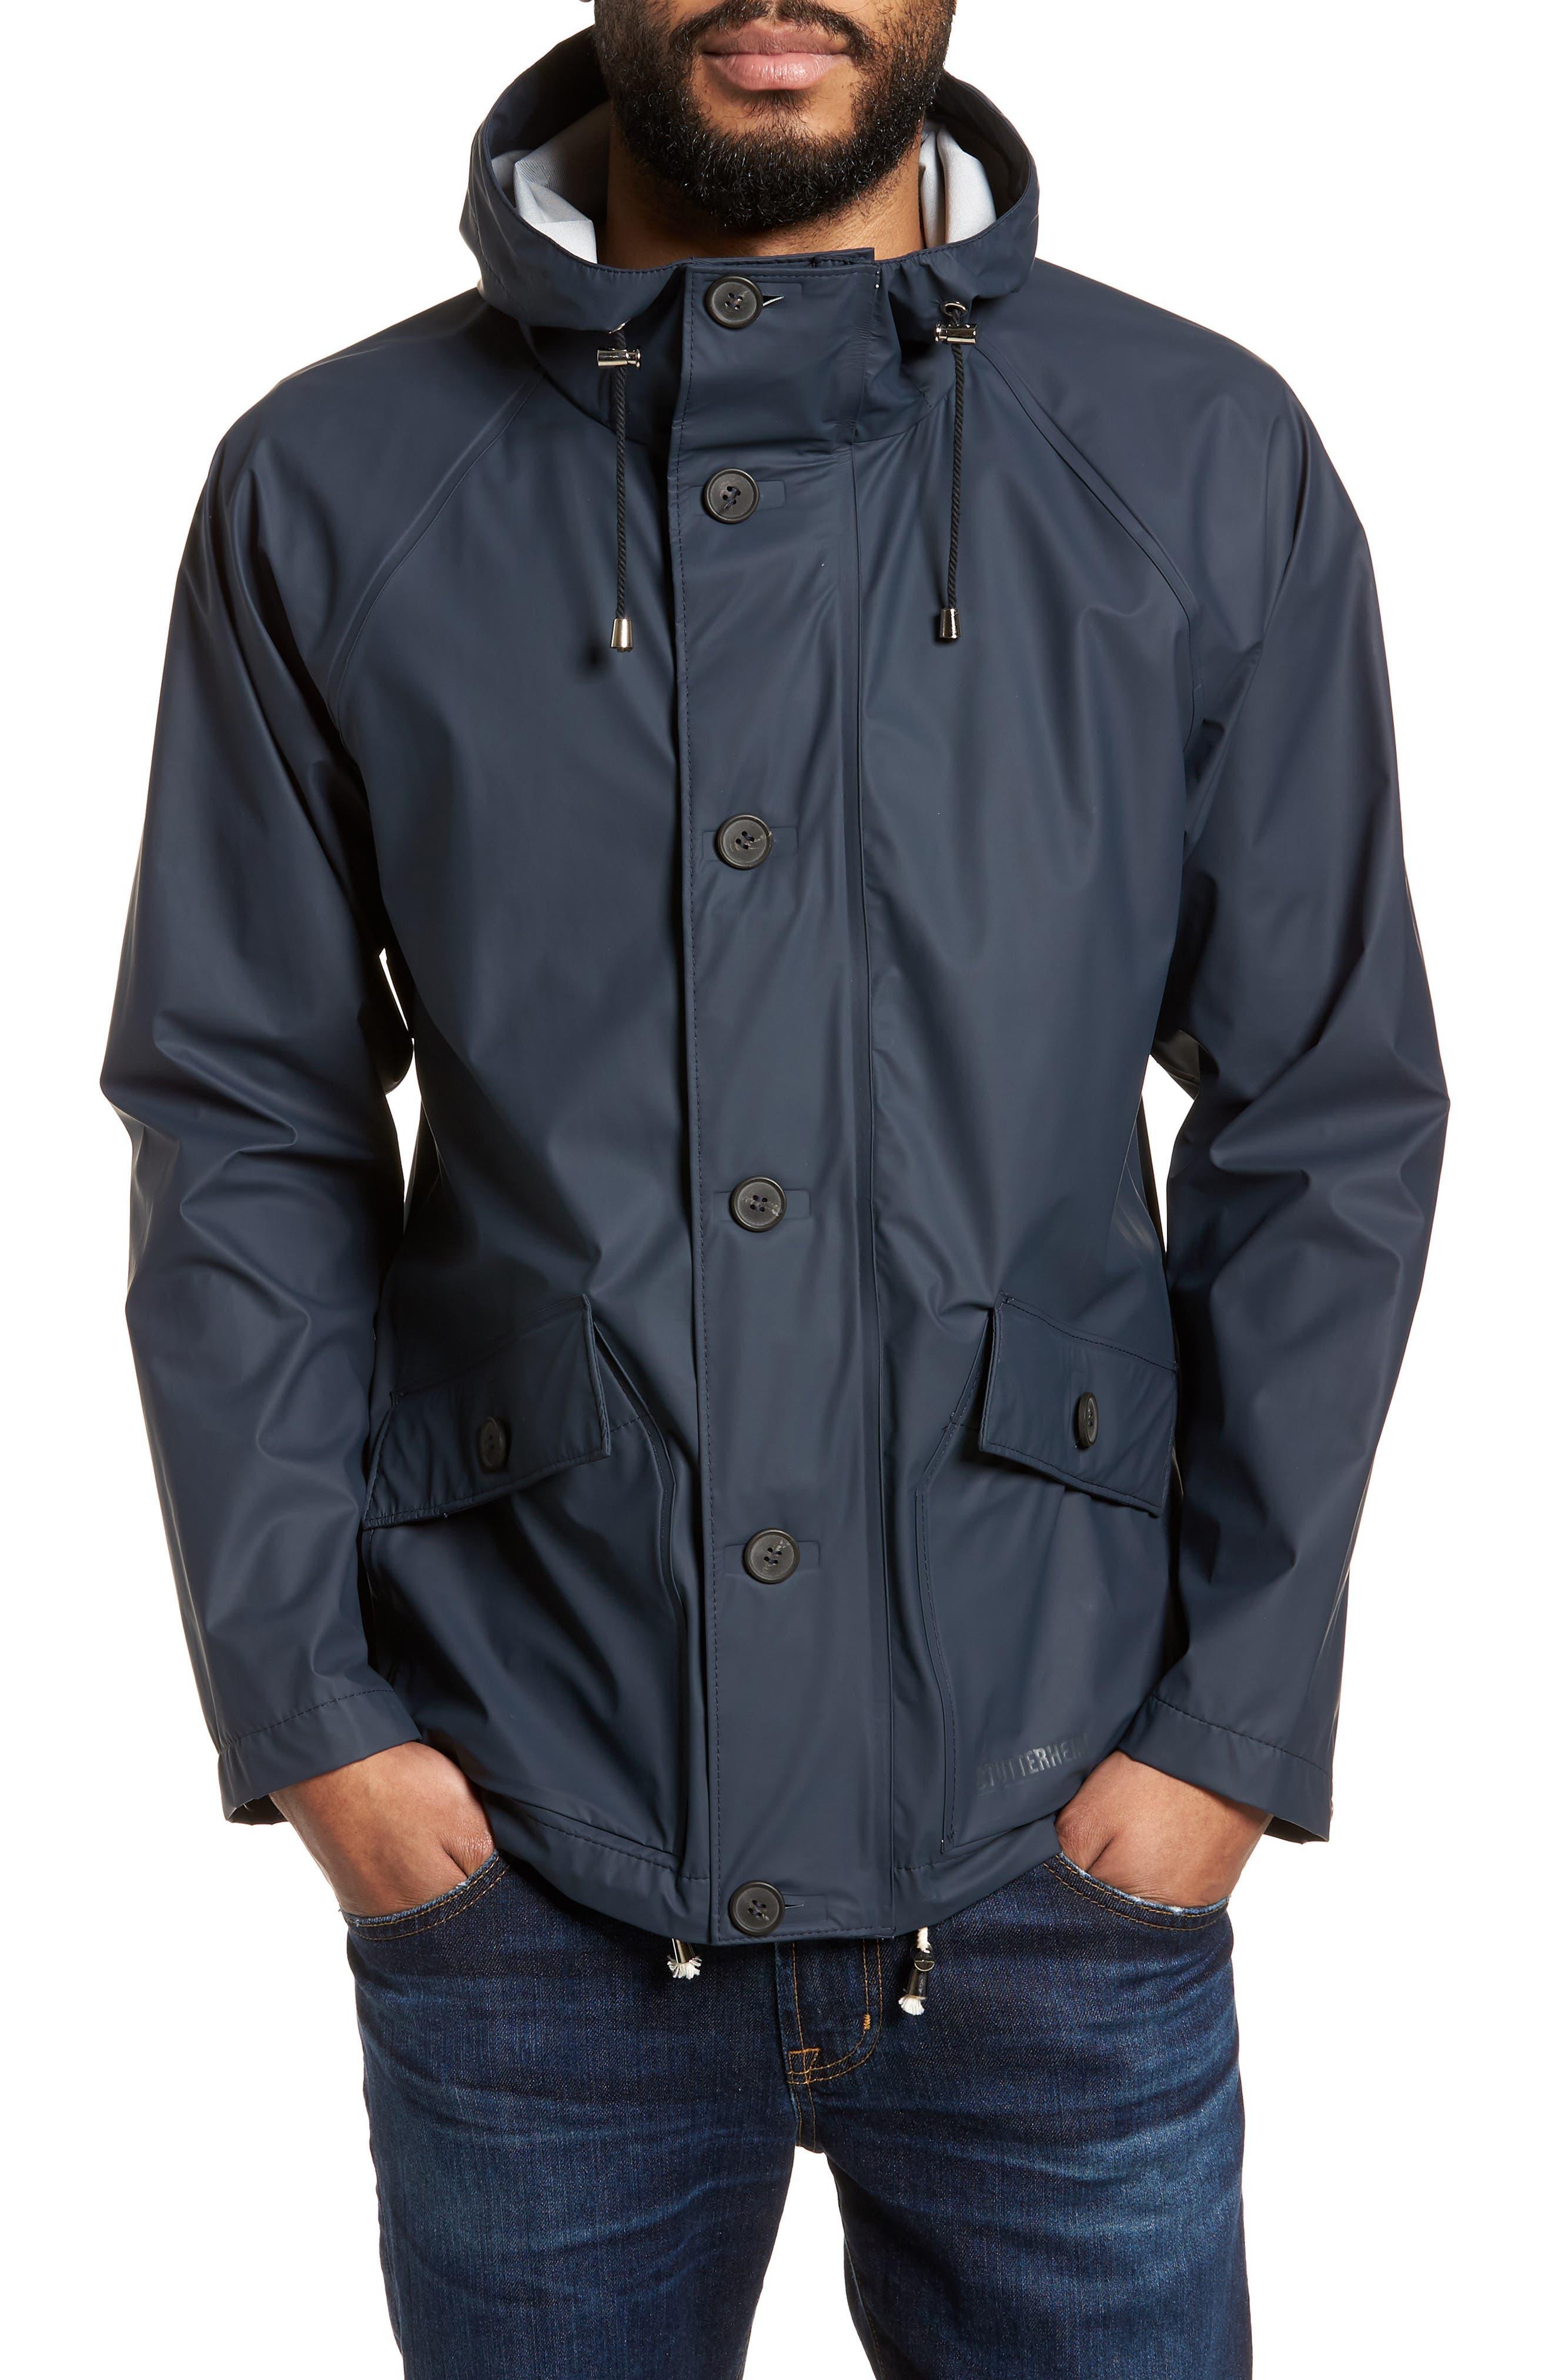 Stenhamra Classic Fit Jacket,                             Main thumbnail 1, color,                             NAVY